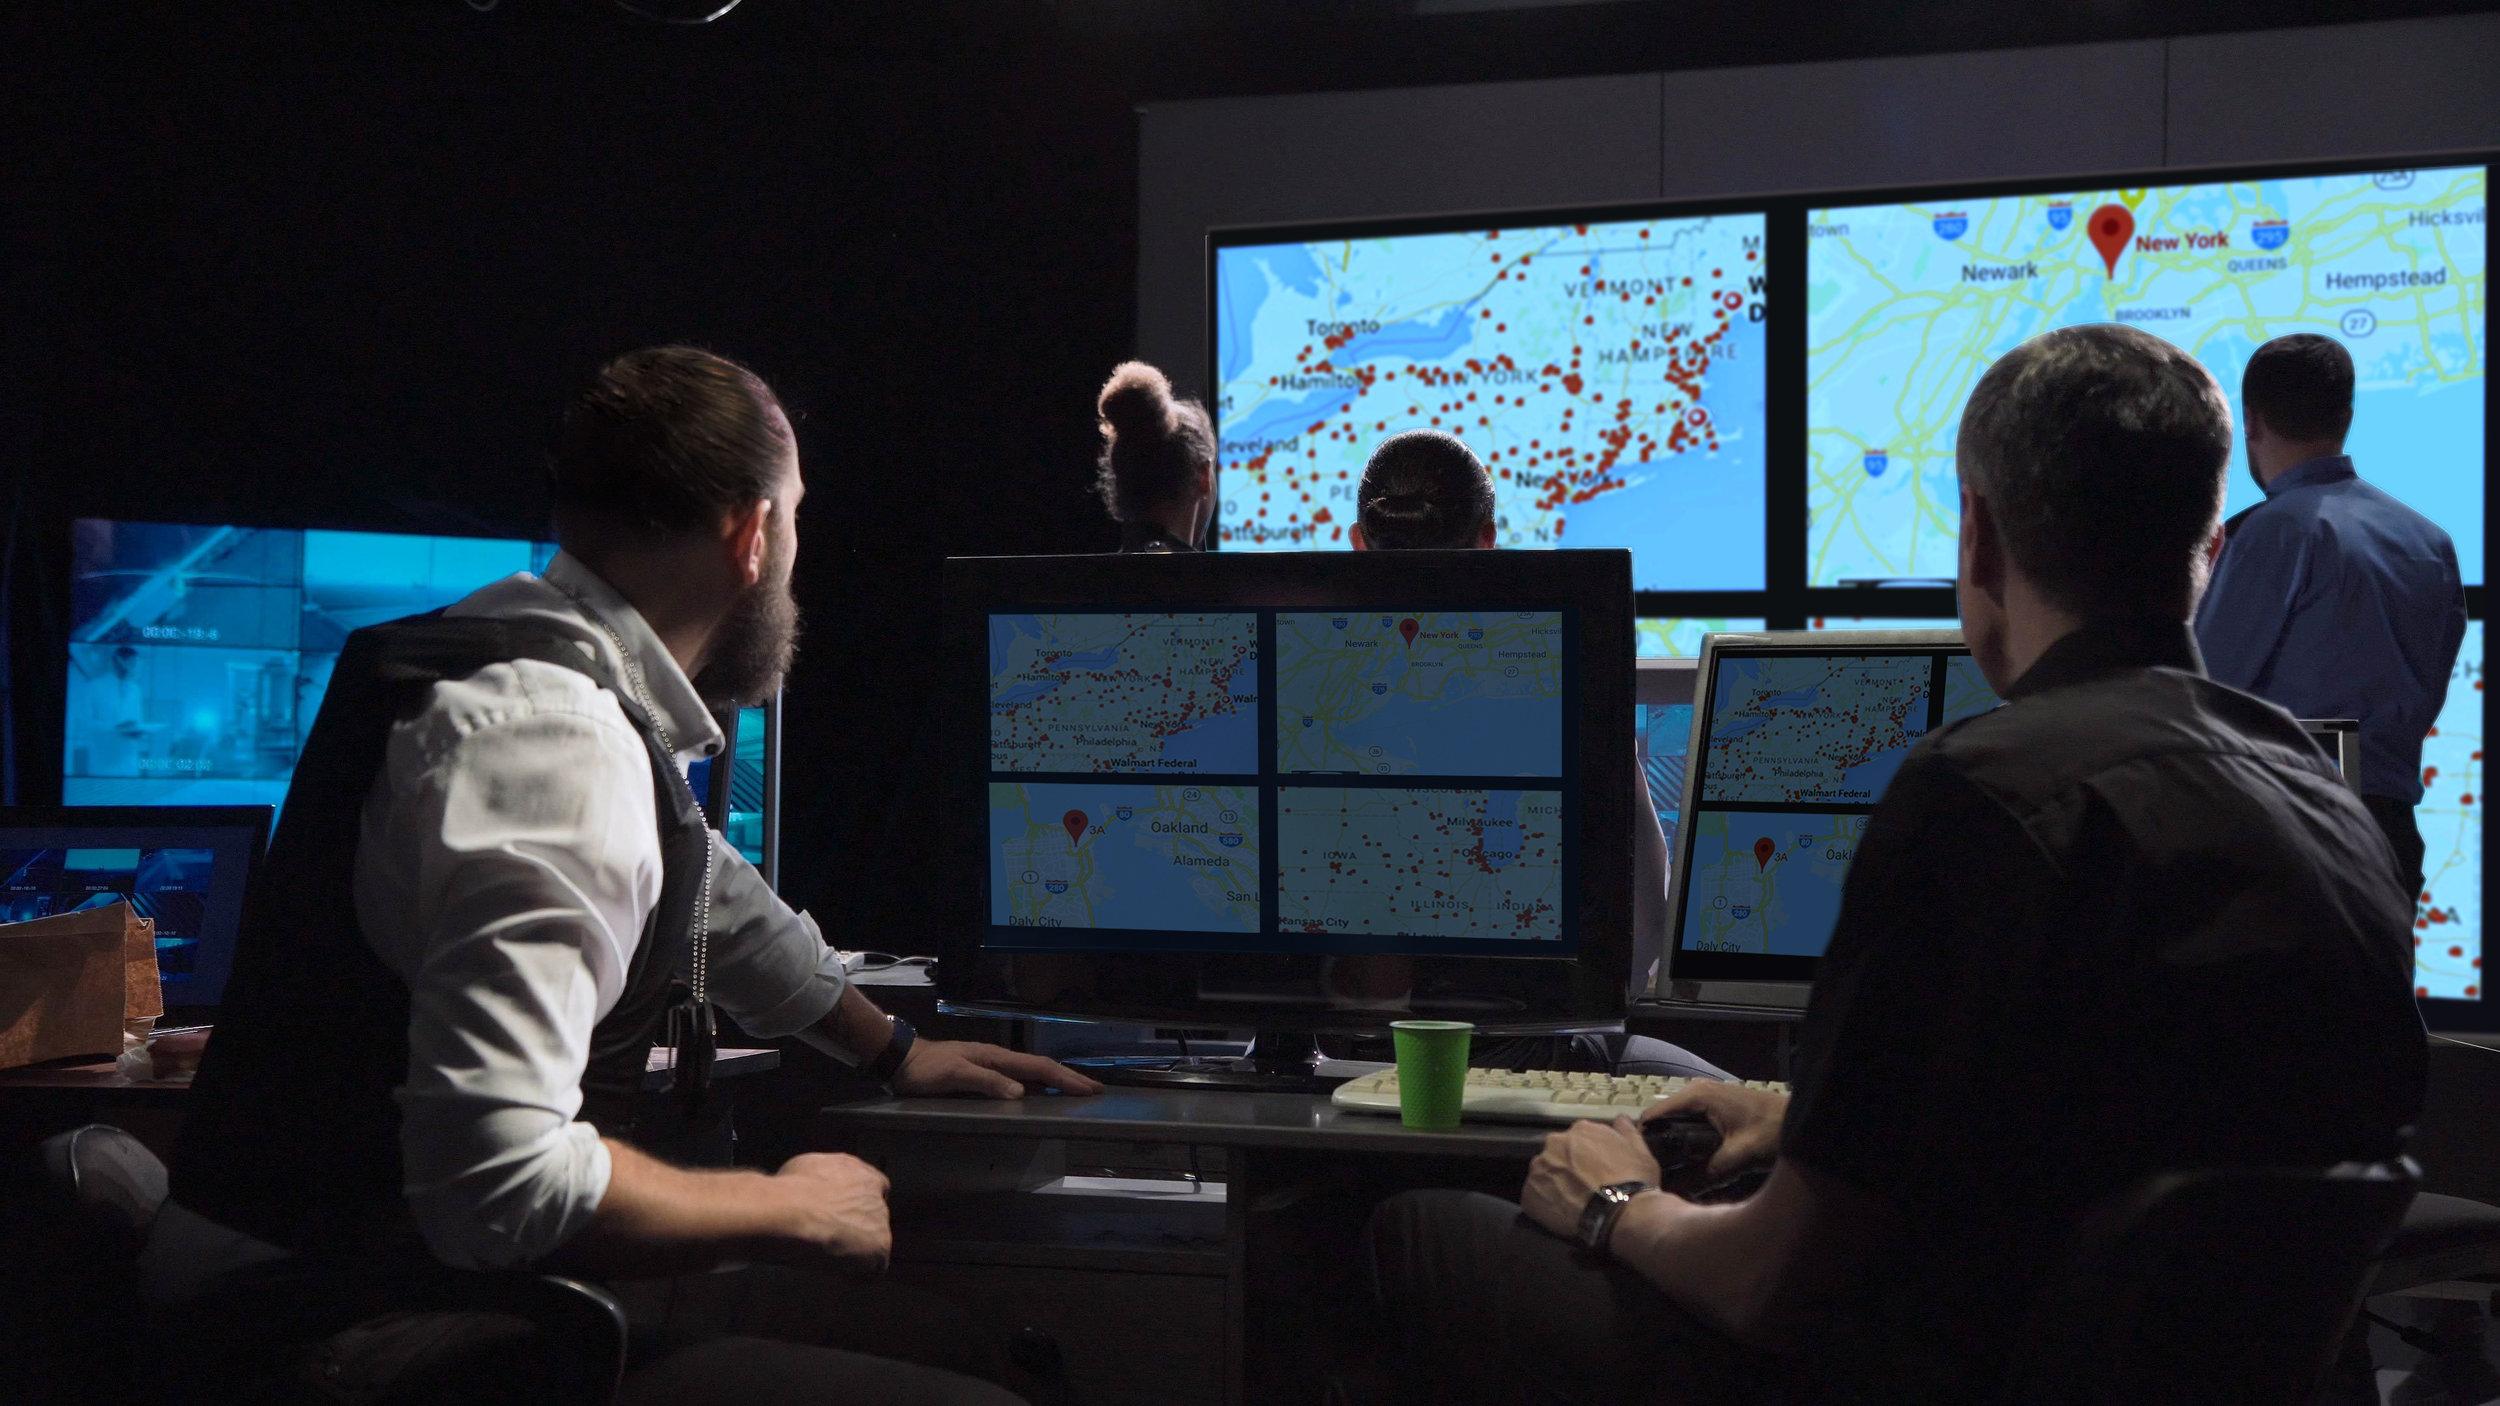 Copy of controlroom.jpg